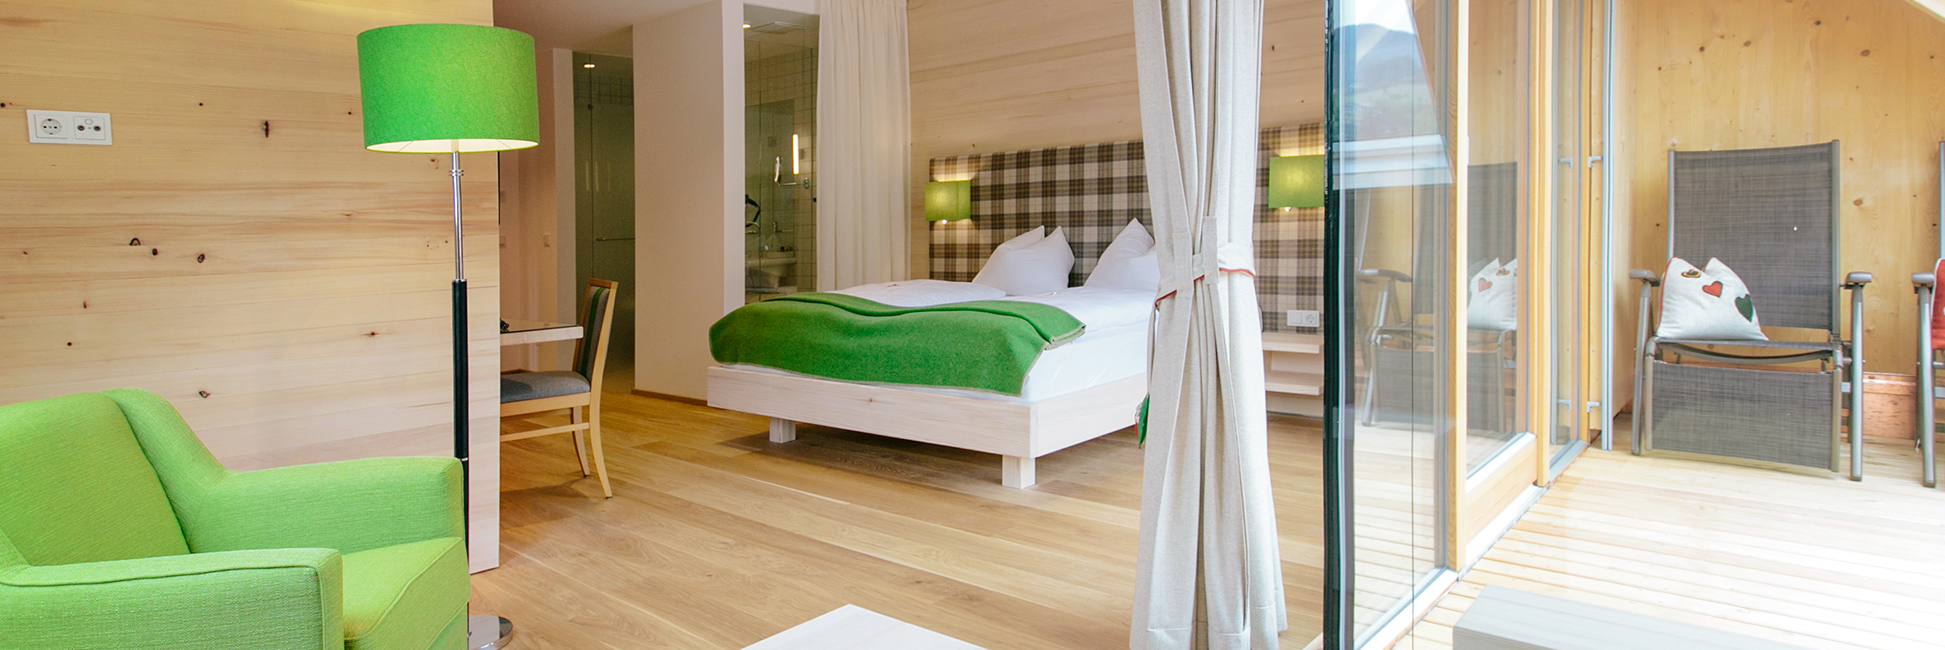 Doppelbett im Zimmer Wolfgangsee de luxe